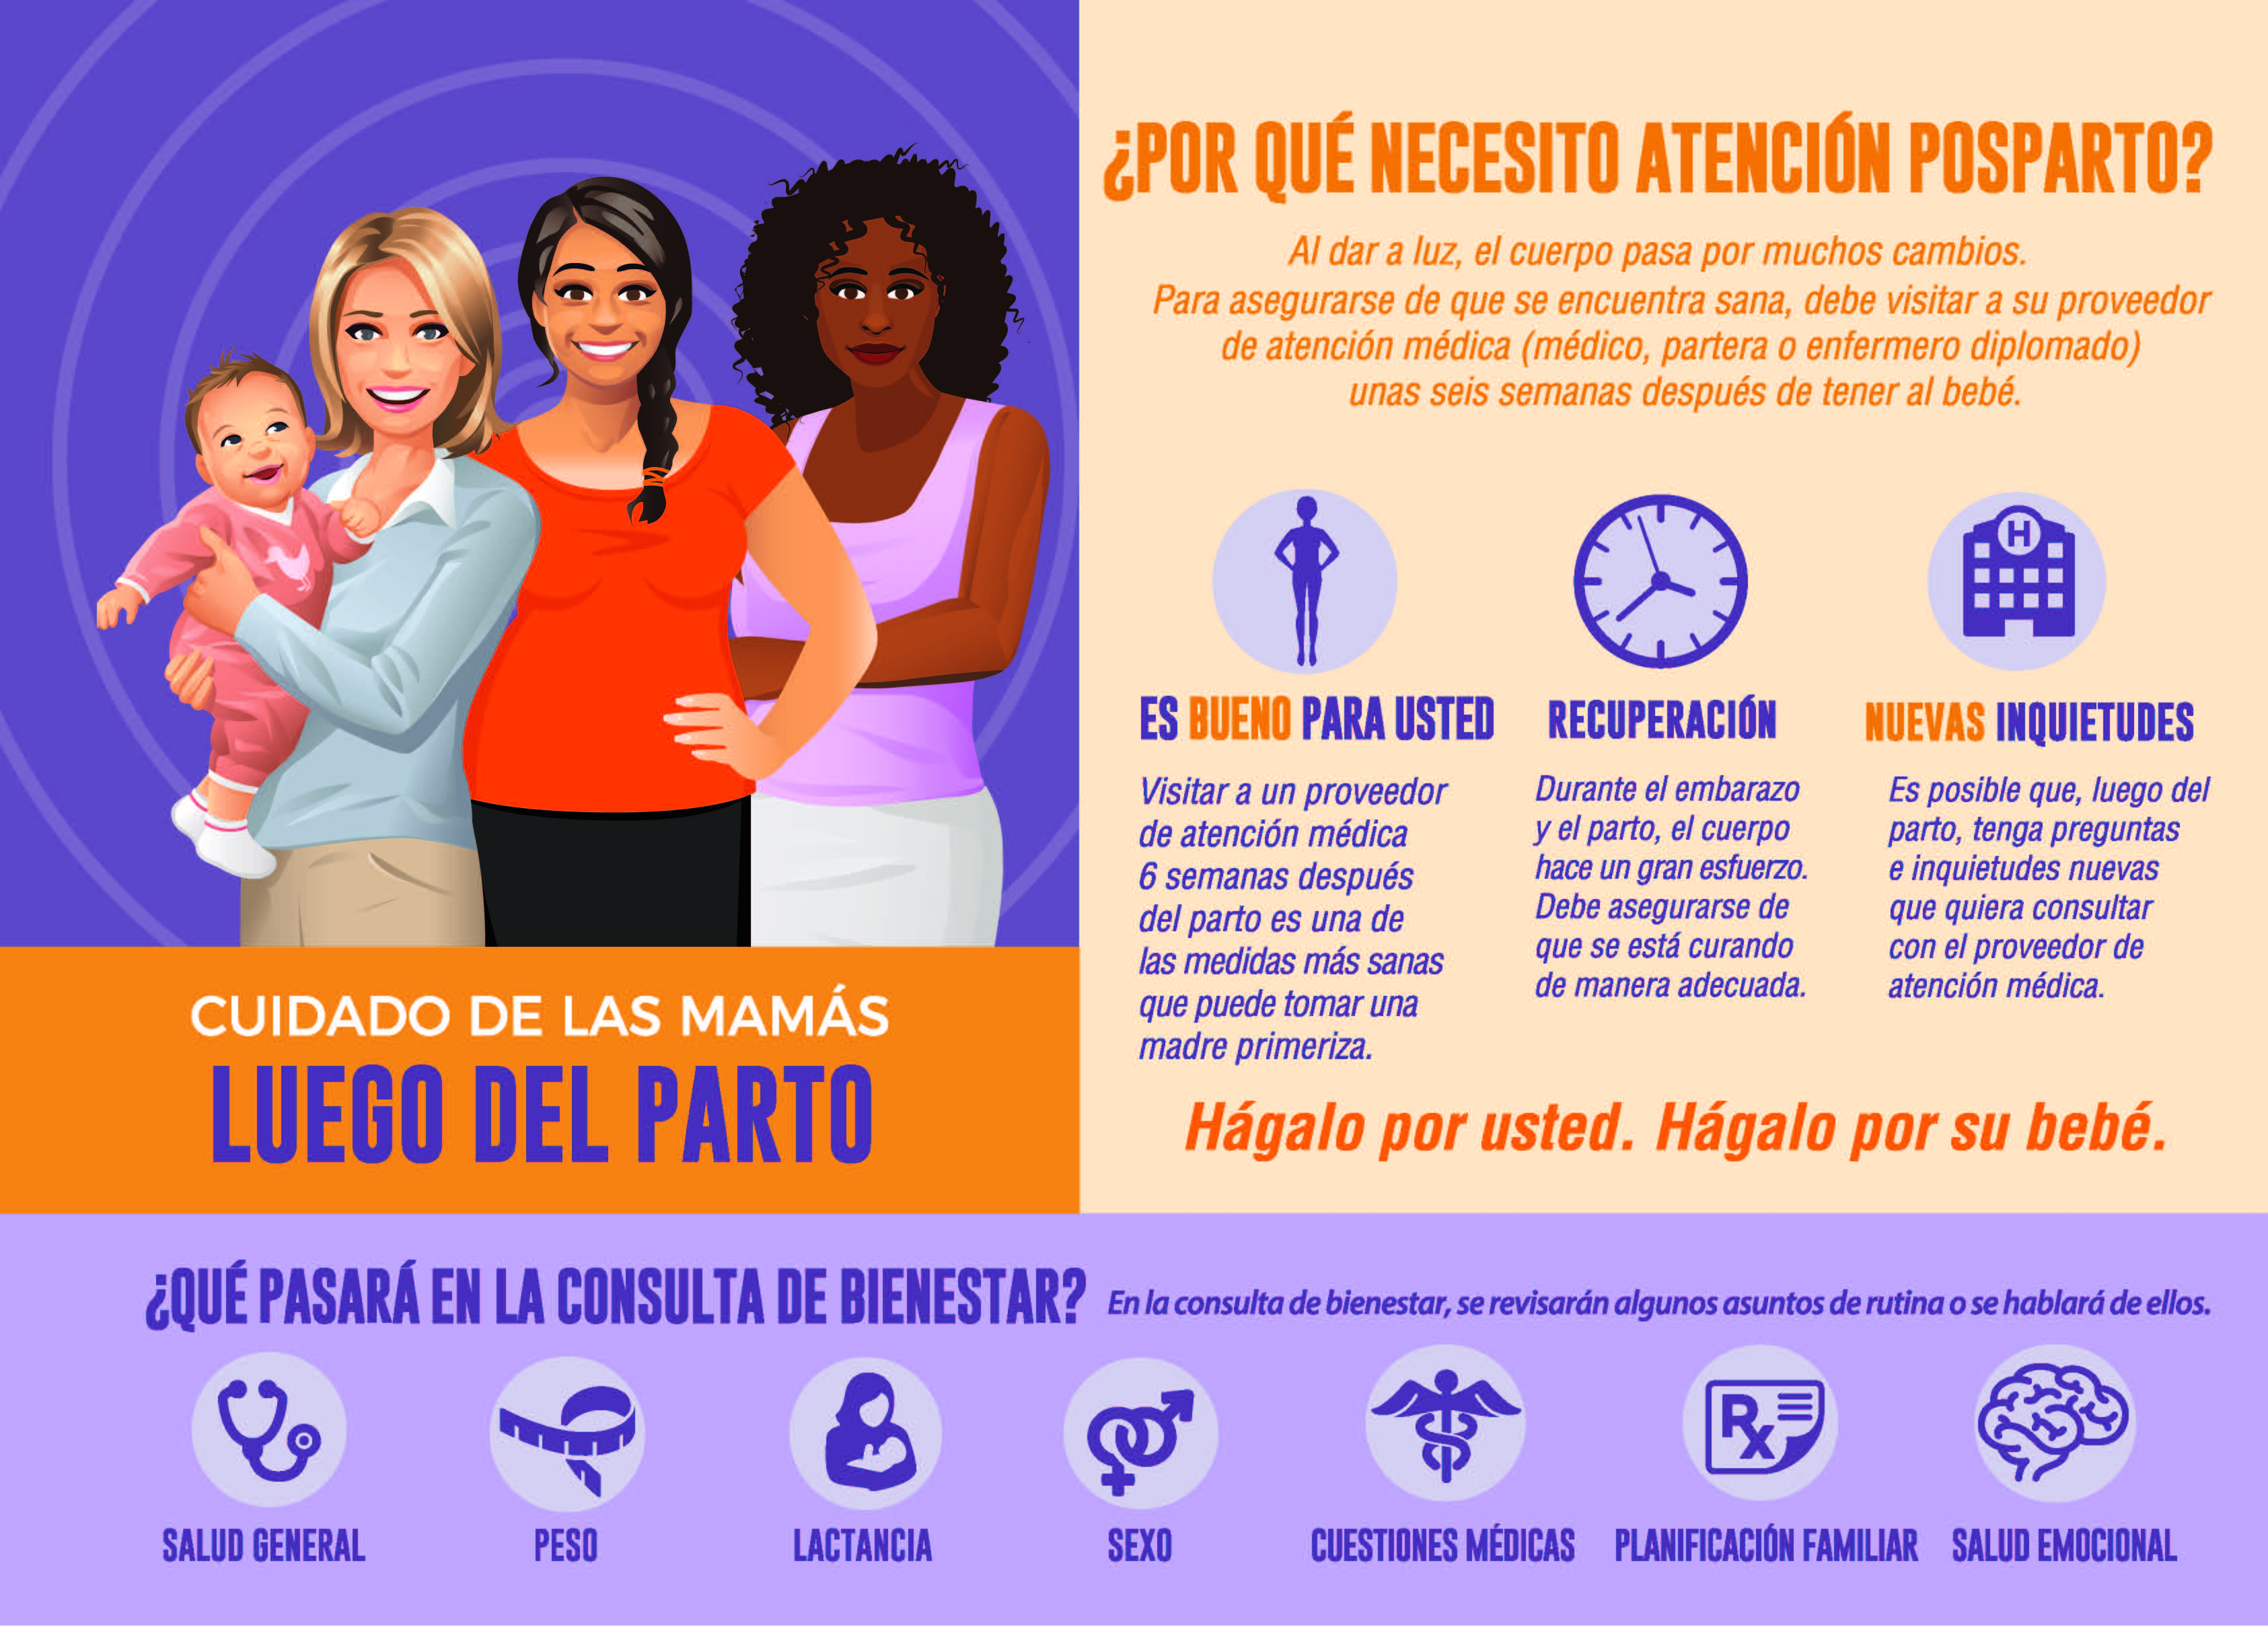 Postpartum Visit Infographic Poster (Spanish)